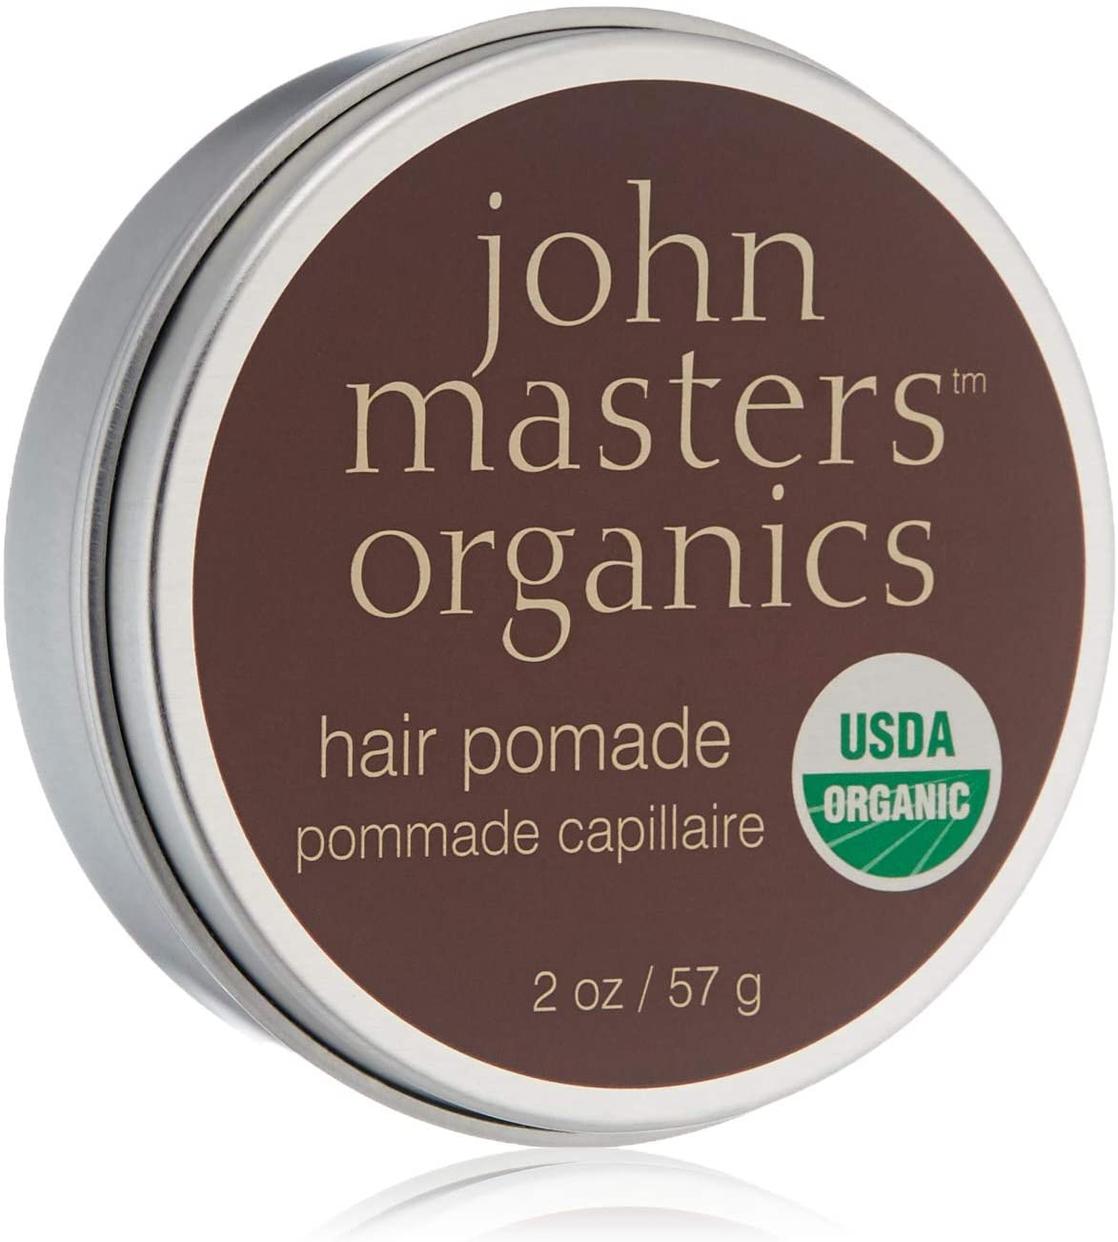 john masters organics(ジョンマスターオーガニック) ヘアワックスの商品画像